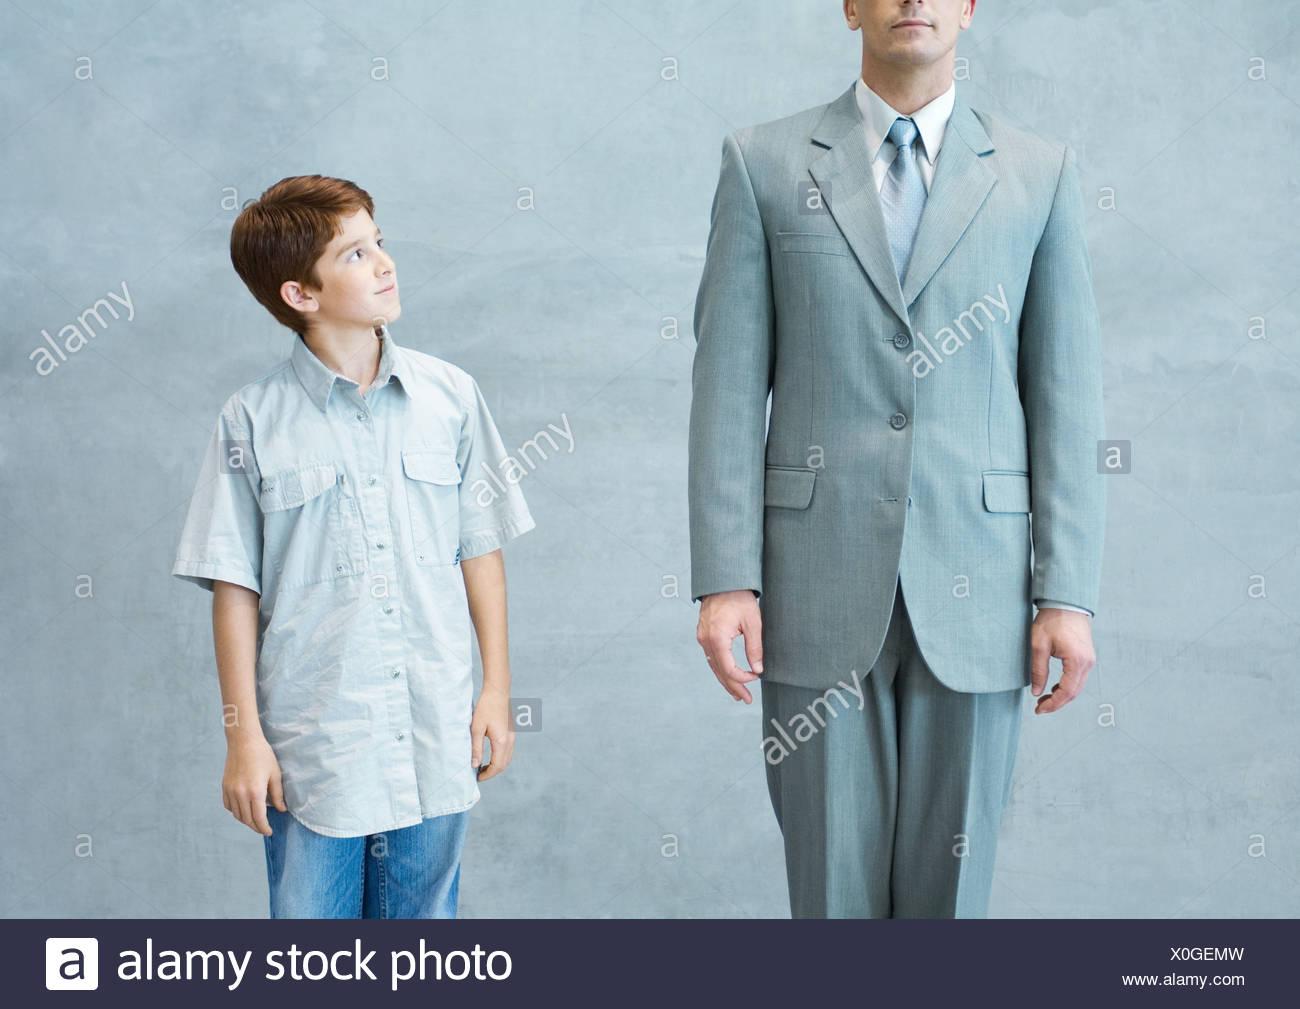 Boy looking up admiringly at businessman - Stock Image